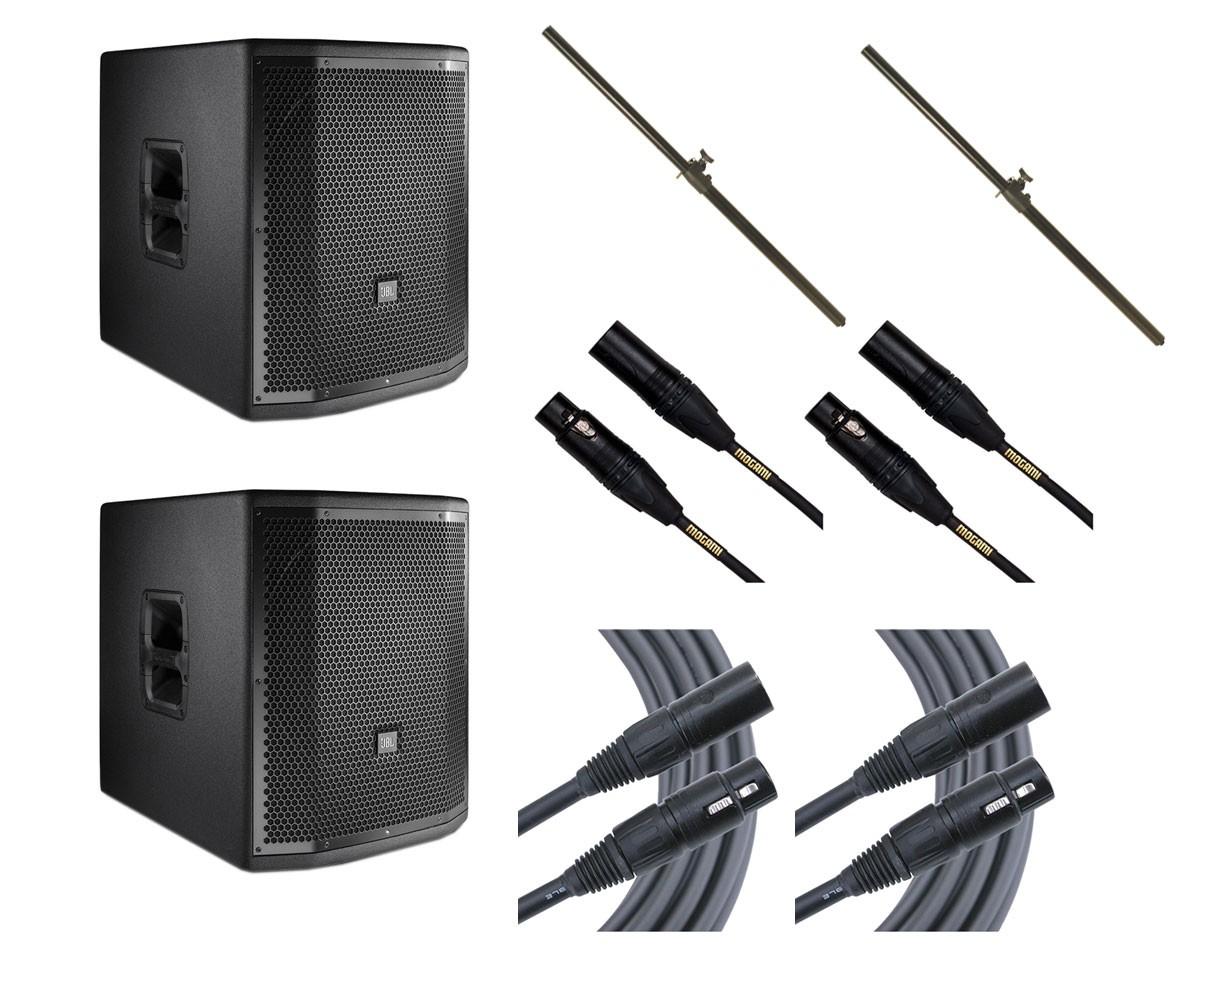 2x JBL PRX815XLFW + Poles + Mogami Cables